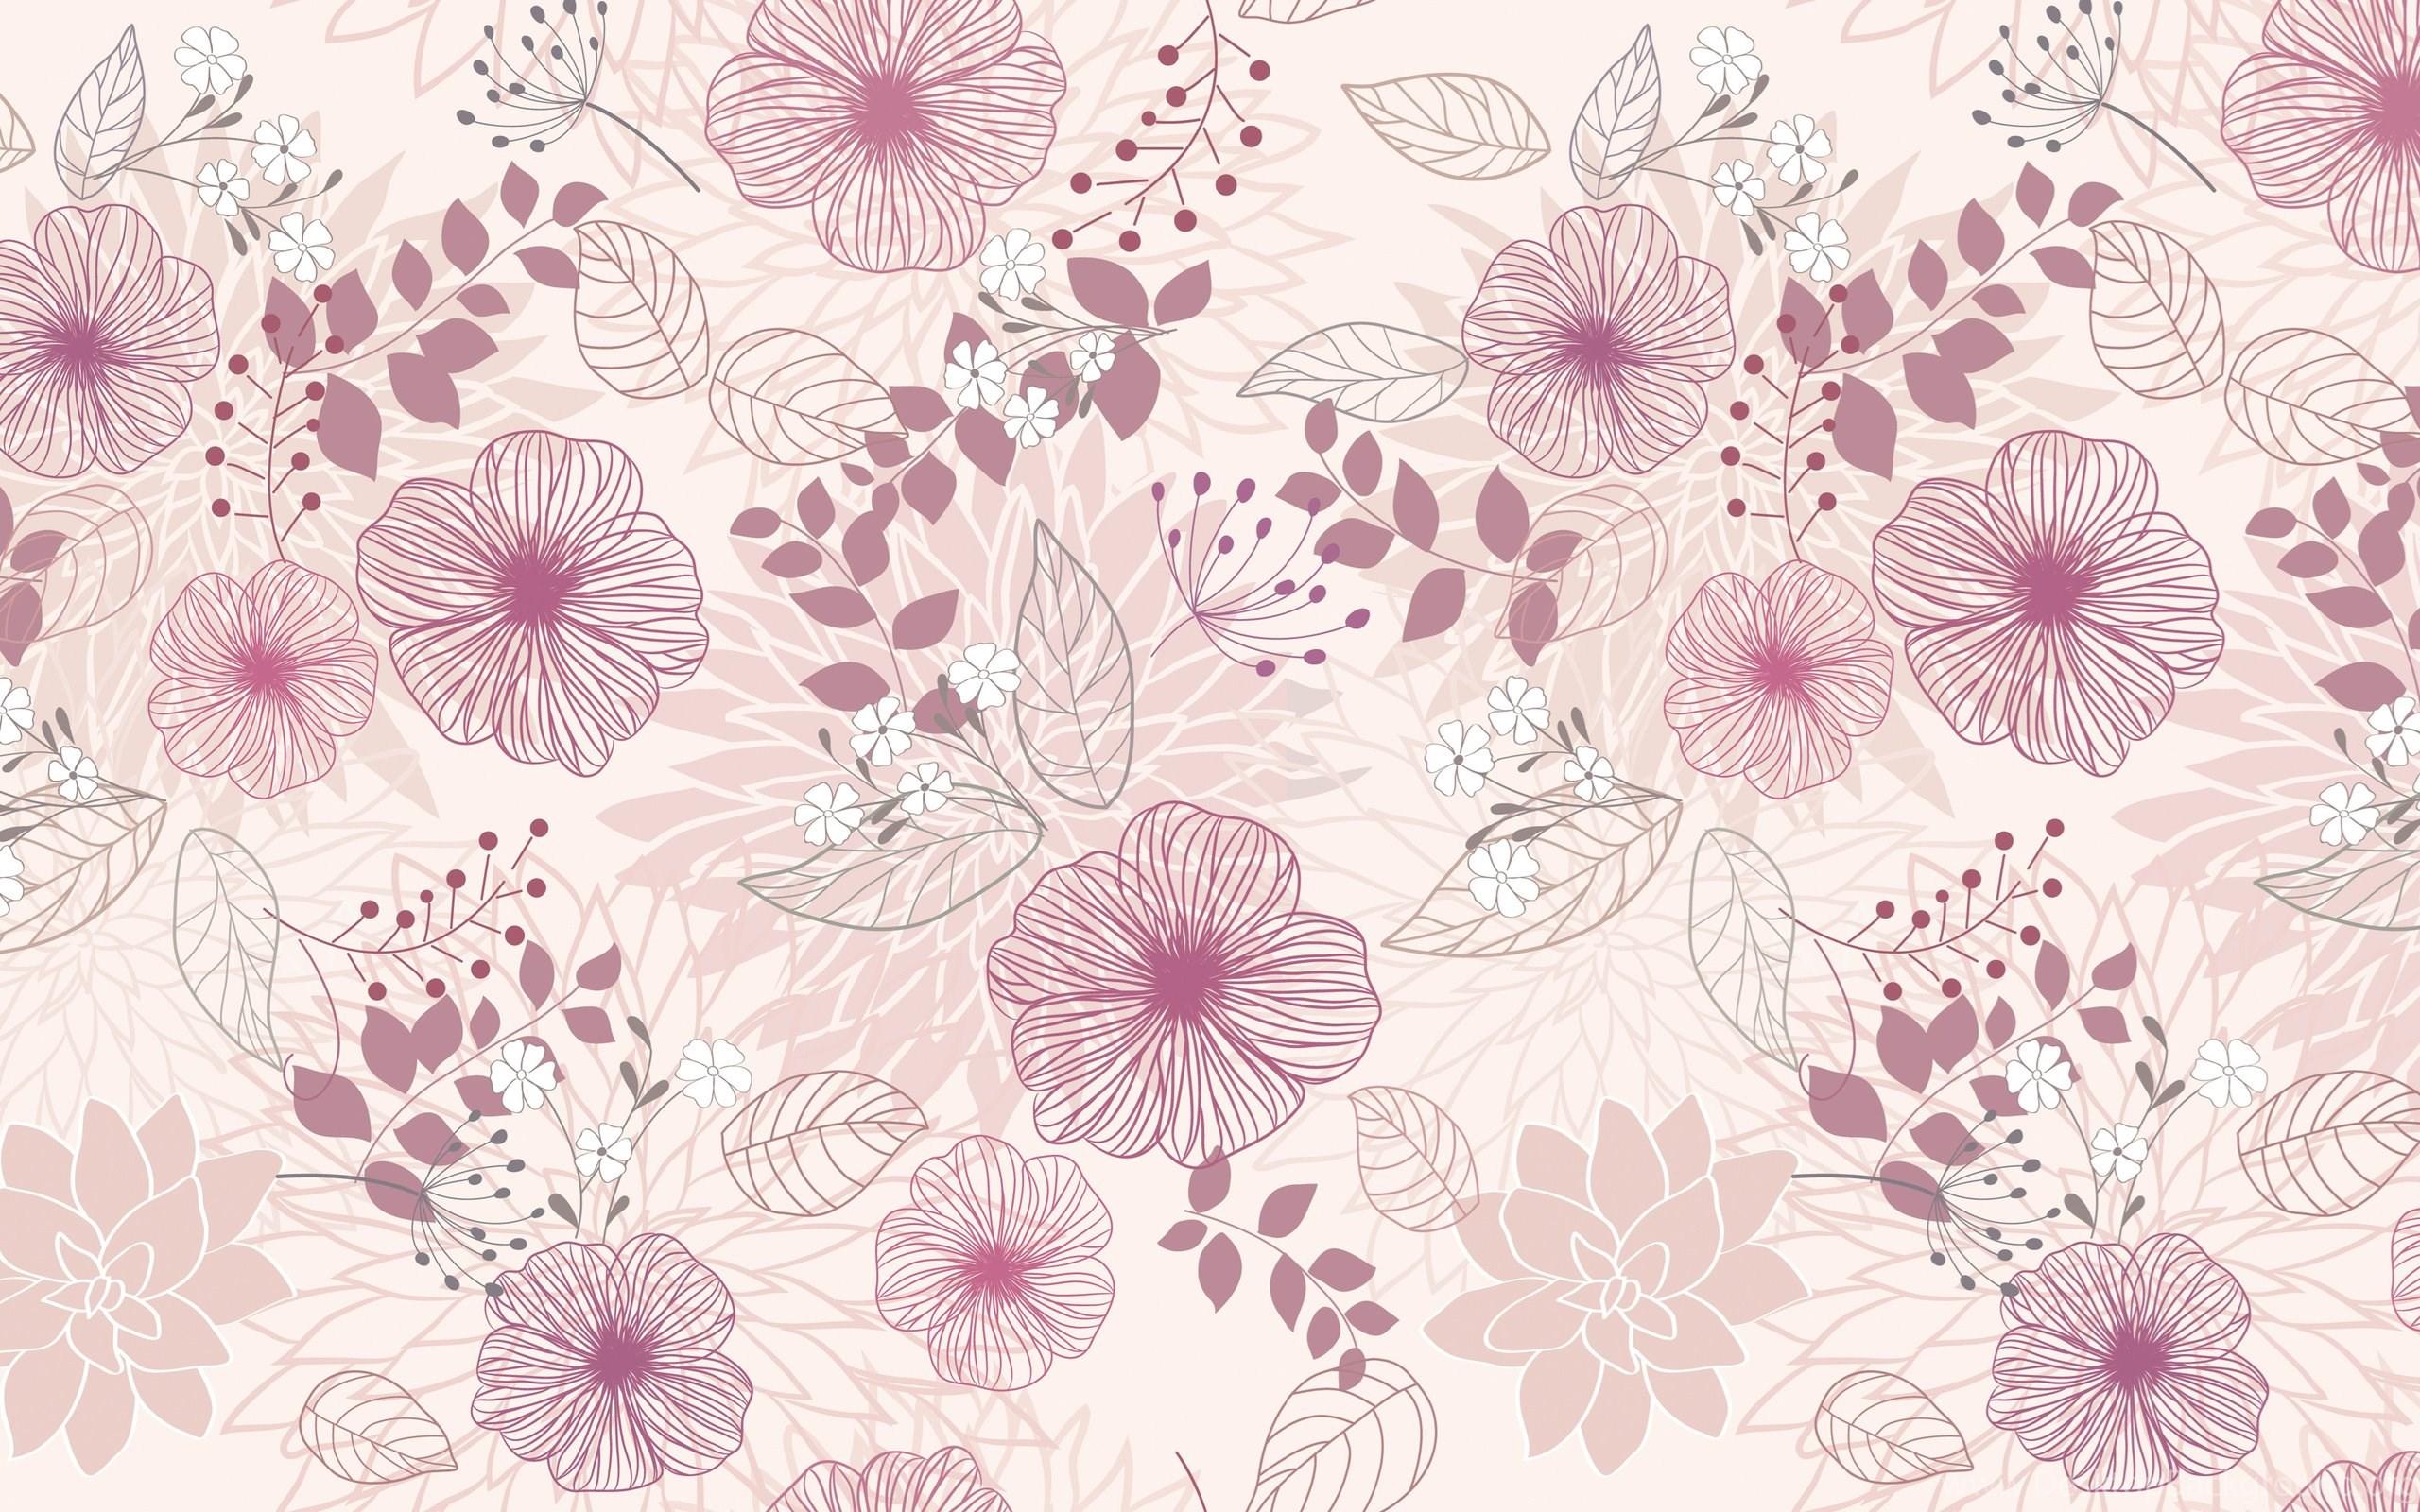 artistic beautiful flower backgrounds desktop background